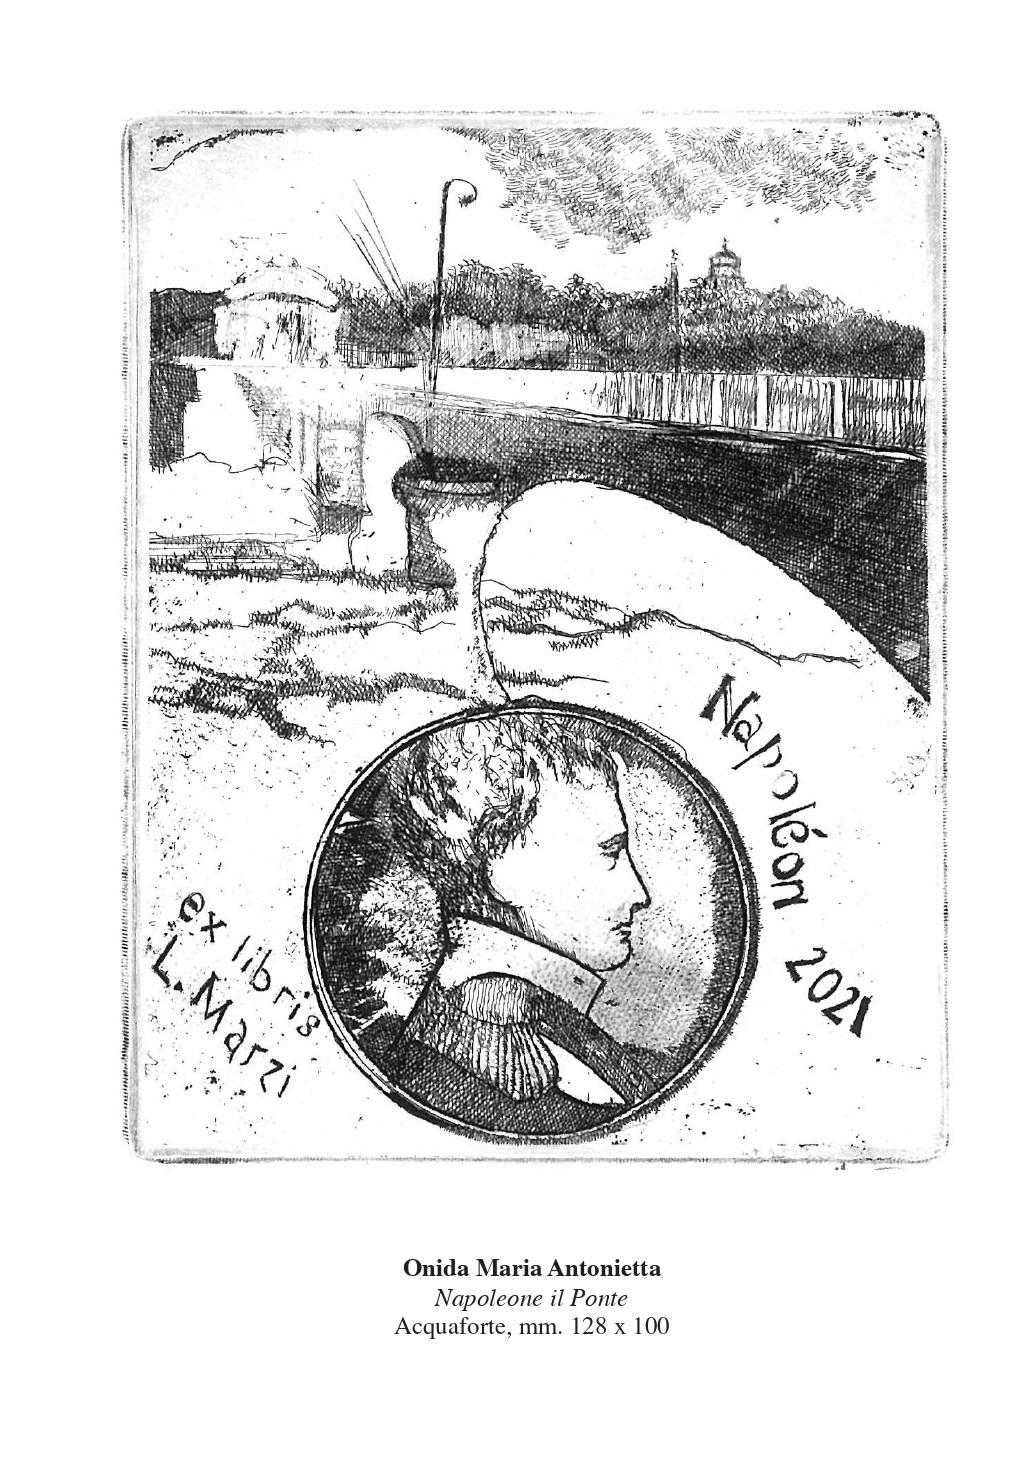 CATALOGO exlibris 2021-112_page-0001